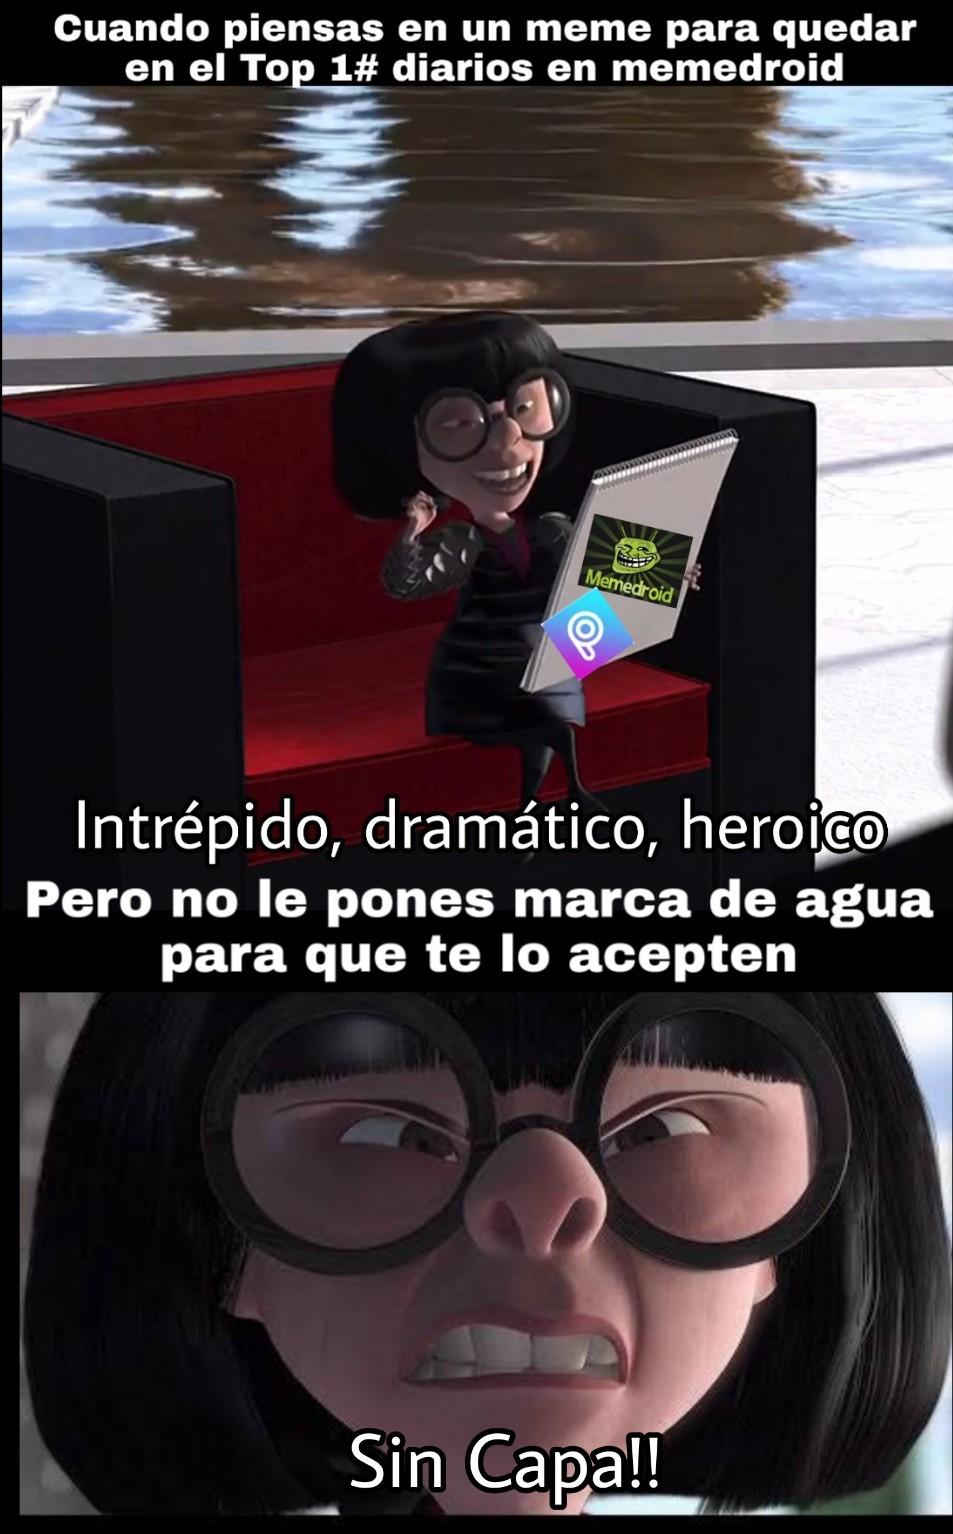 Sin capa, cochinos!! - meme